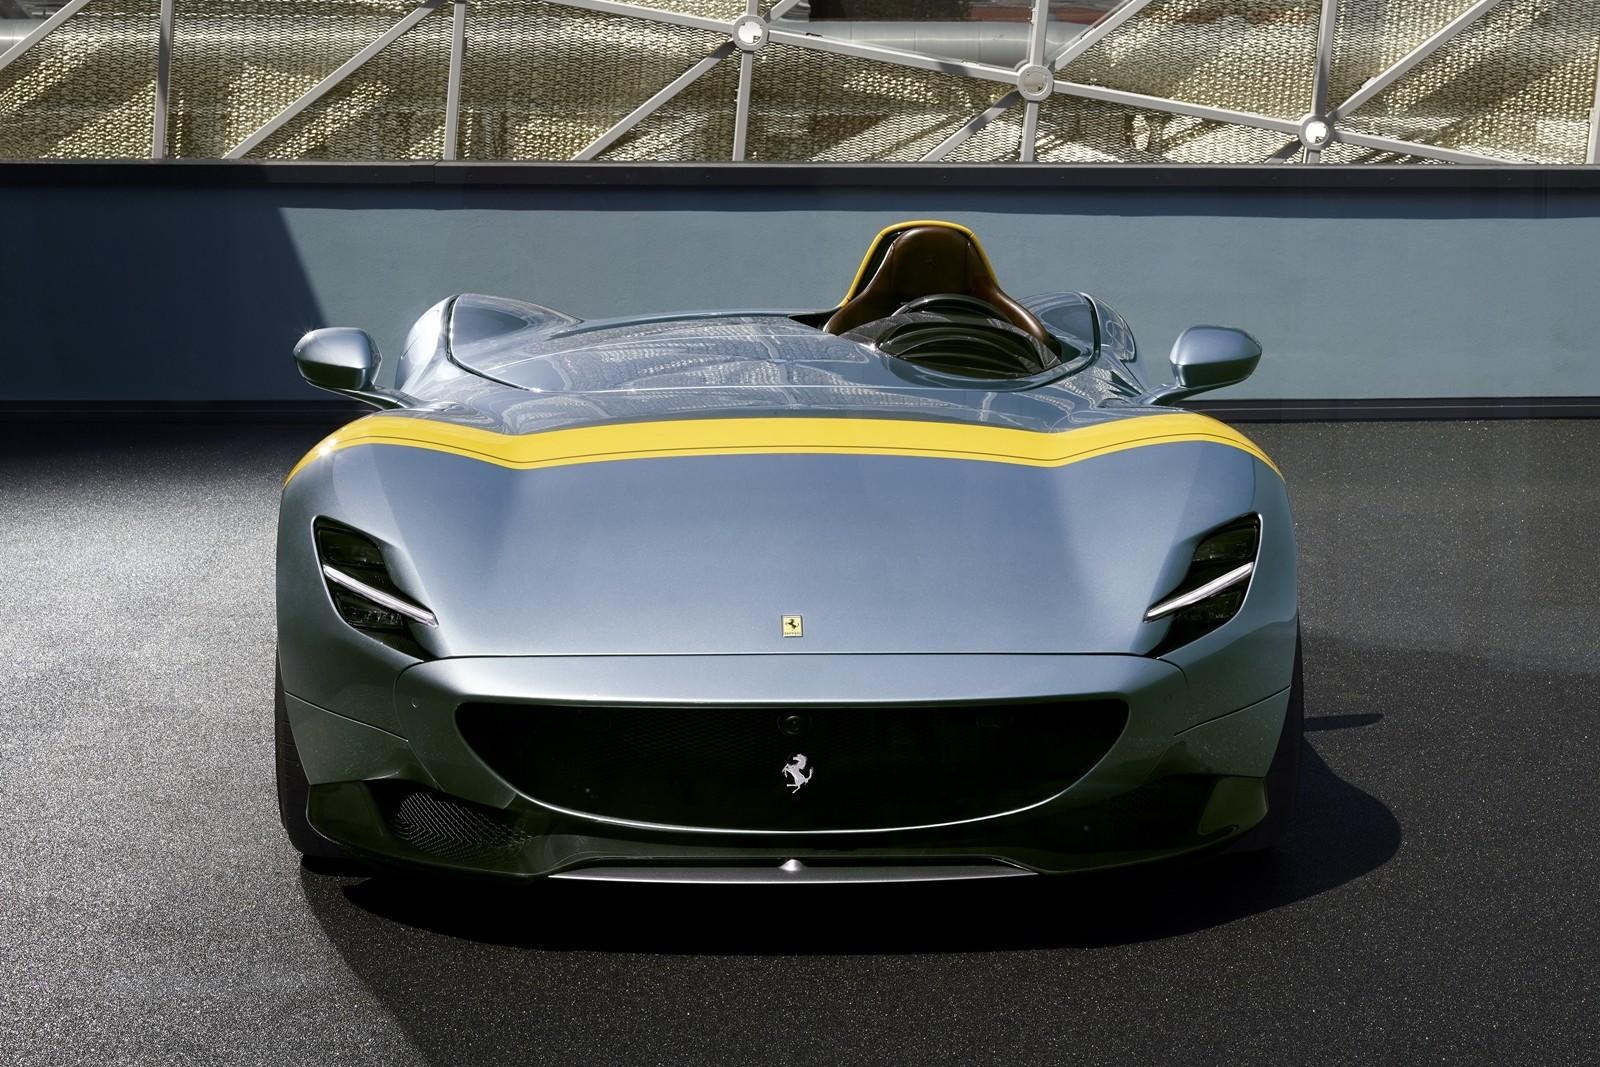 Foto de Ferrari Monza SP1 y Monza SP2 2019 (7/14)